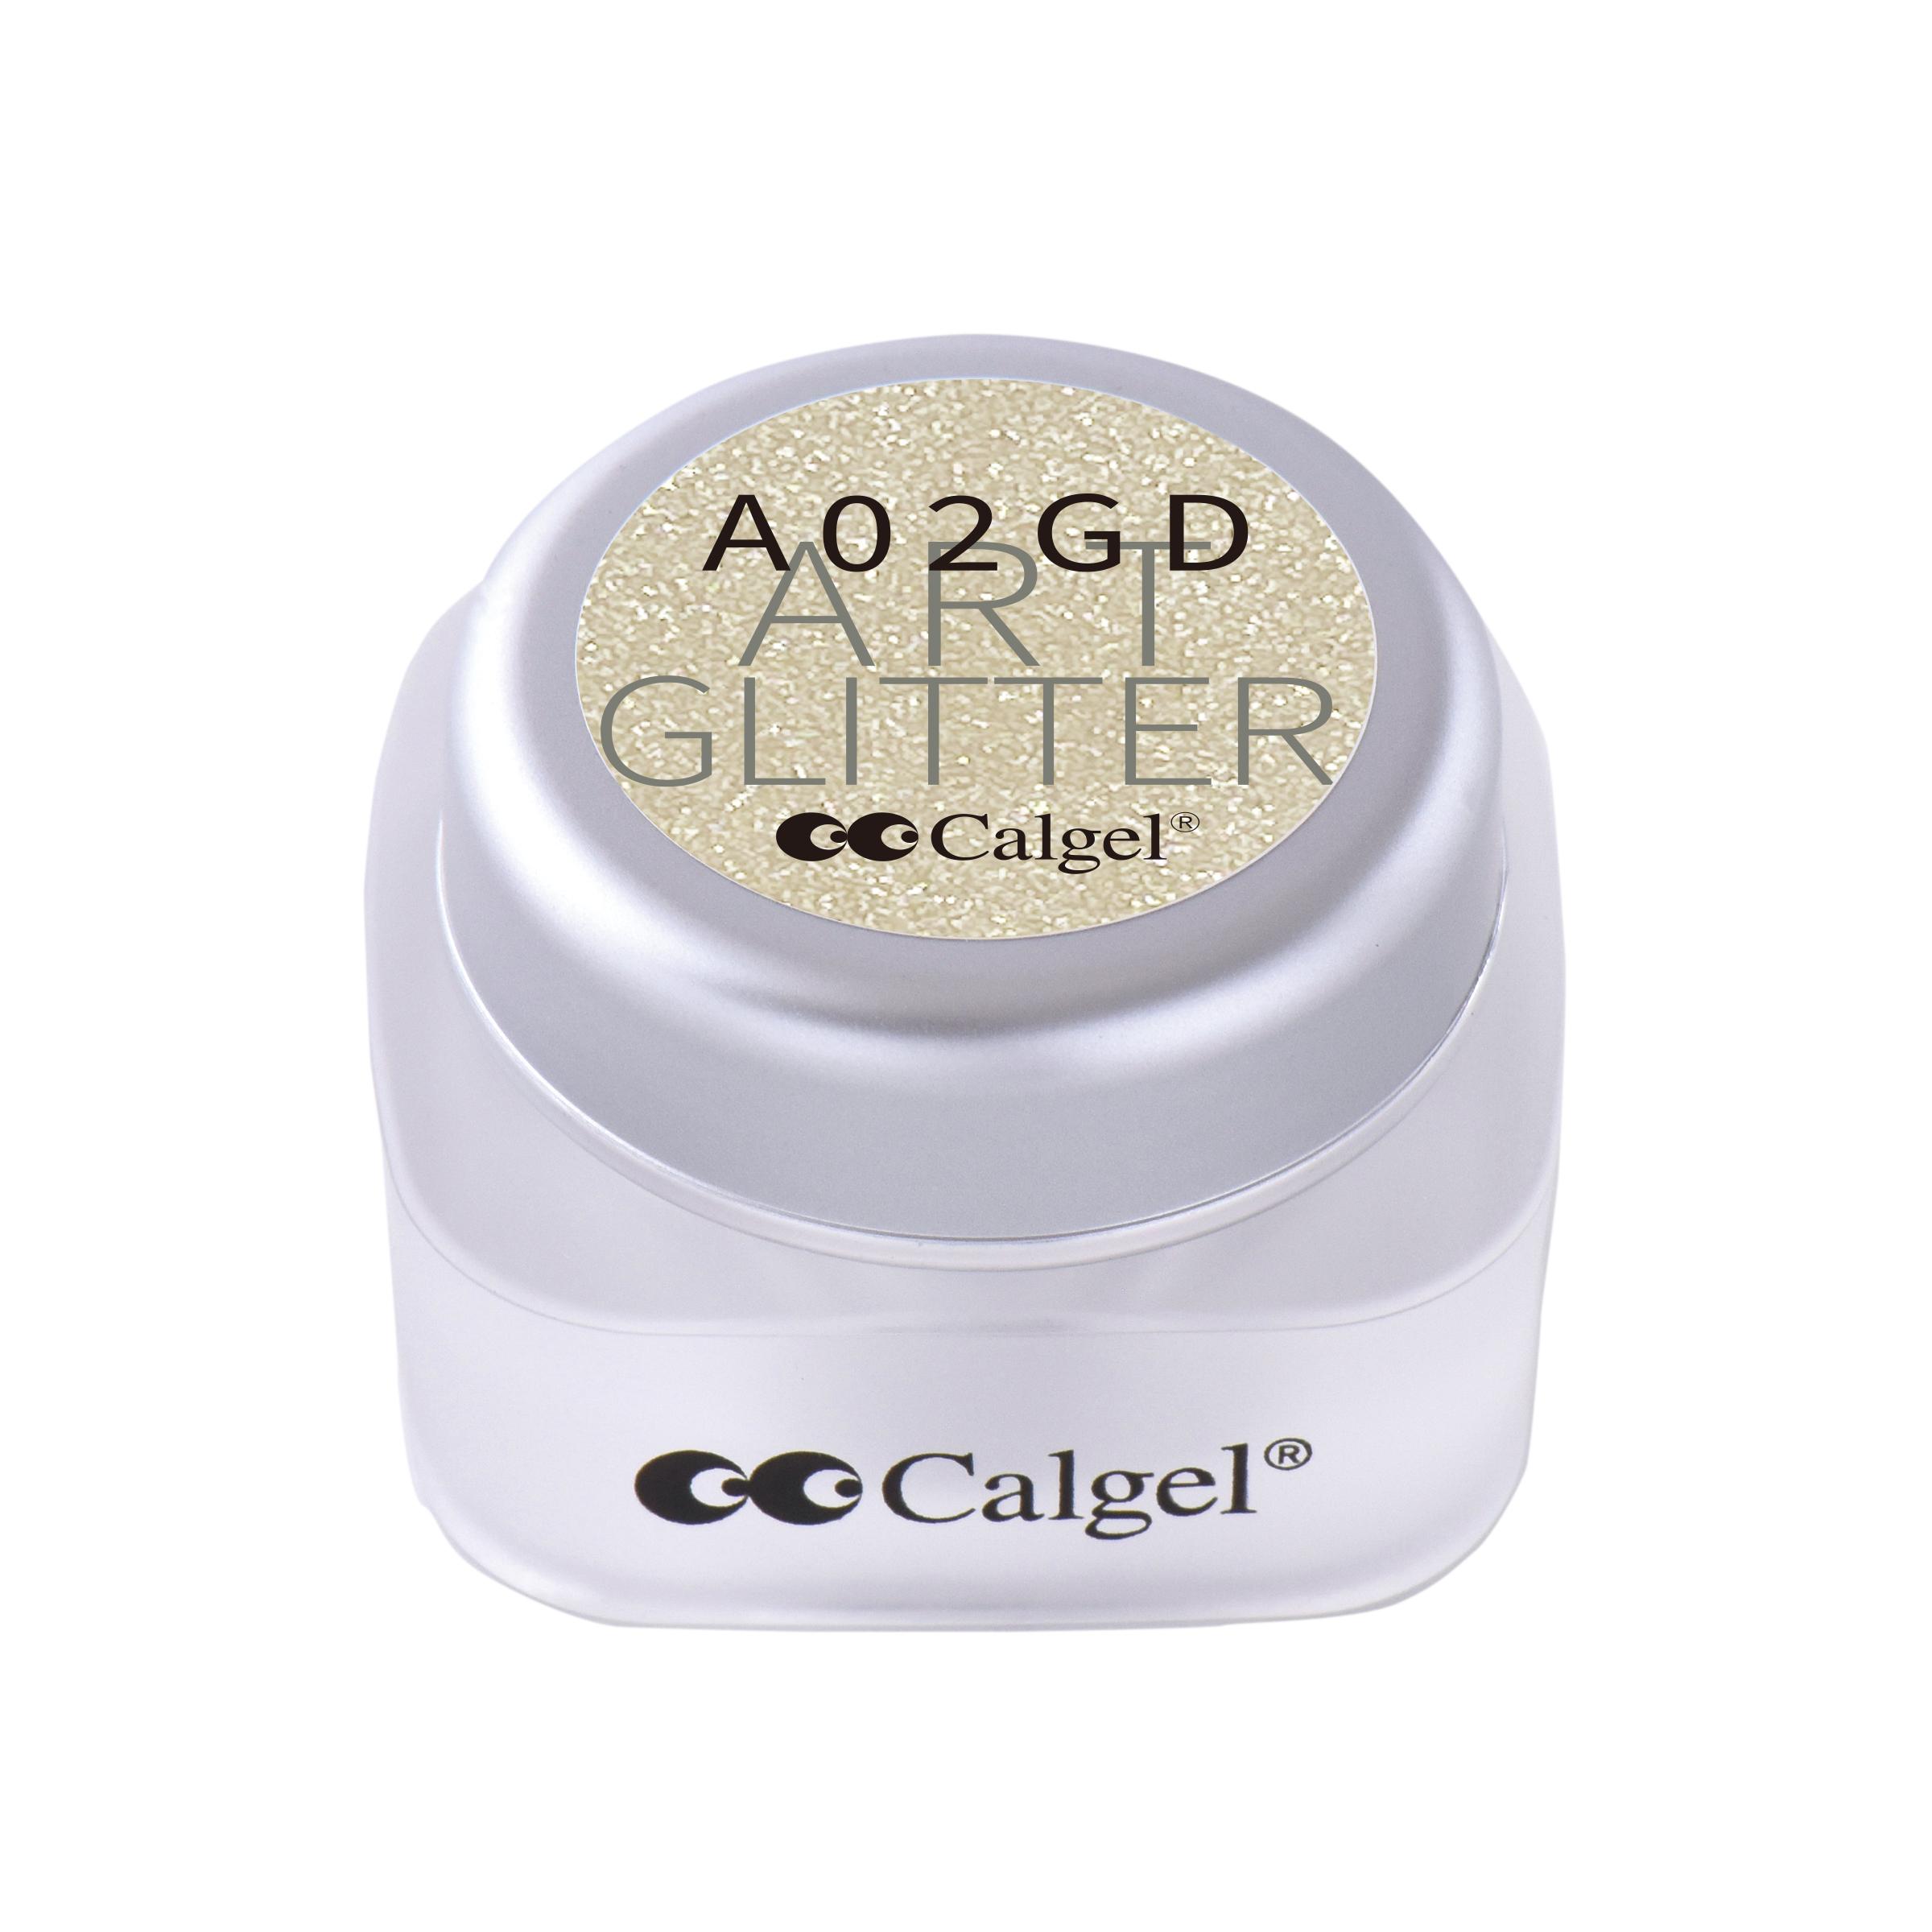 CGA02GD カラーカルジェル プラス アート グリッター プラチナゴールド